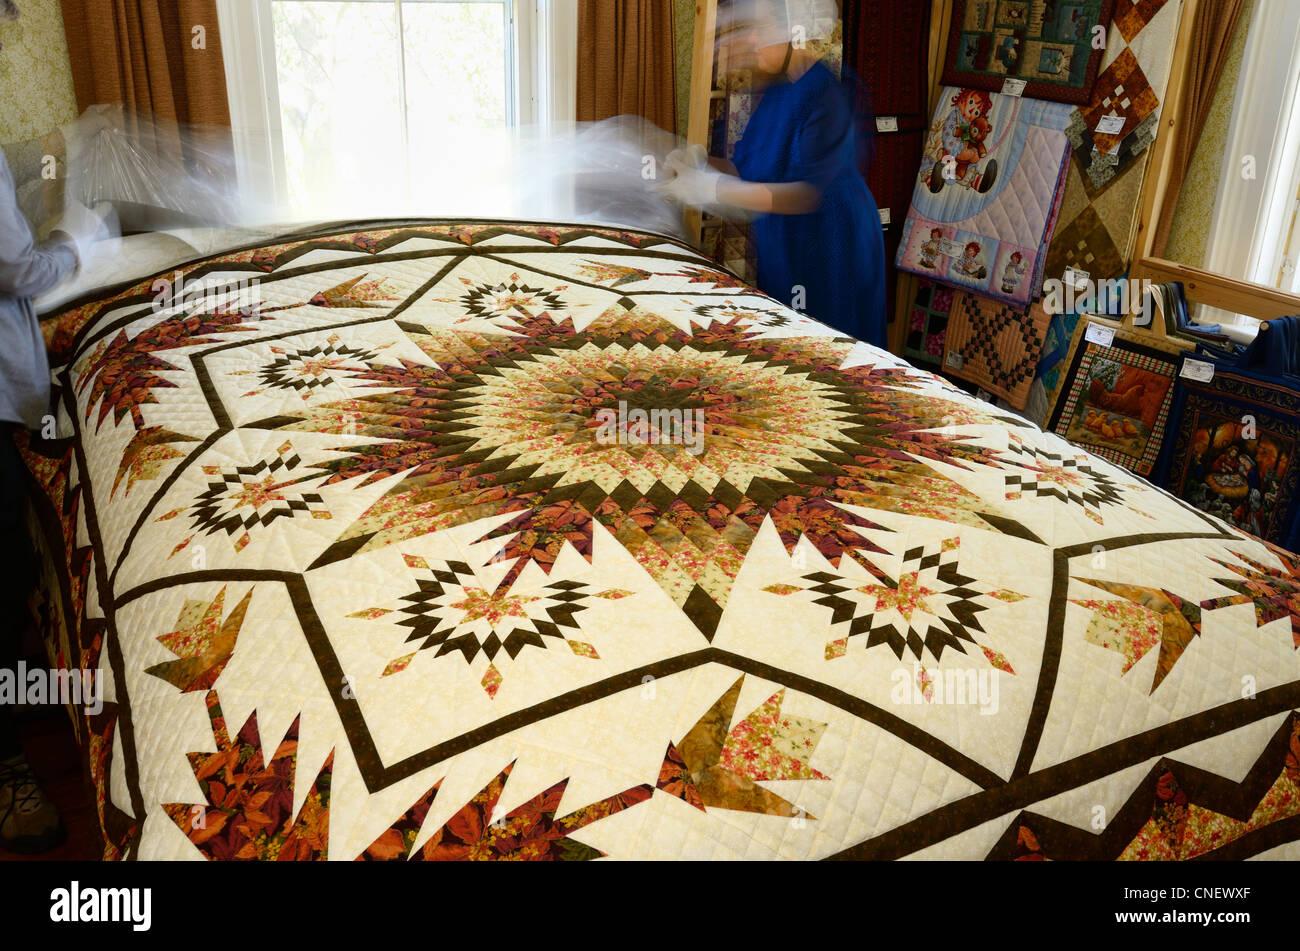 Mennonite Bedroom Furniture Mennonite Seamstress Showing Handmade Quilts In Her Bedroom Near